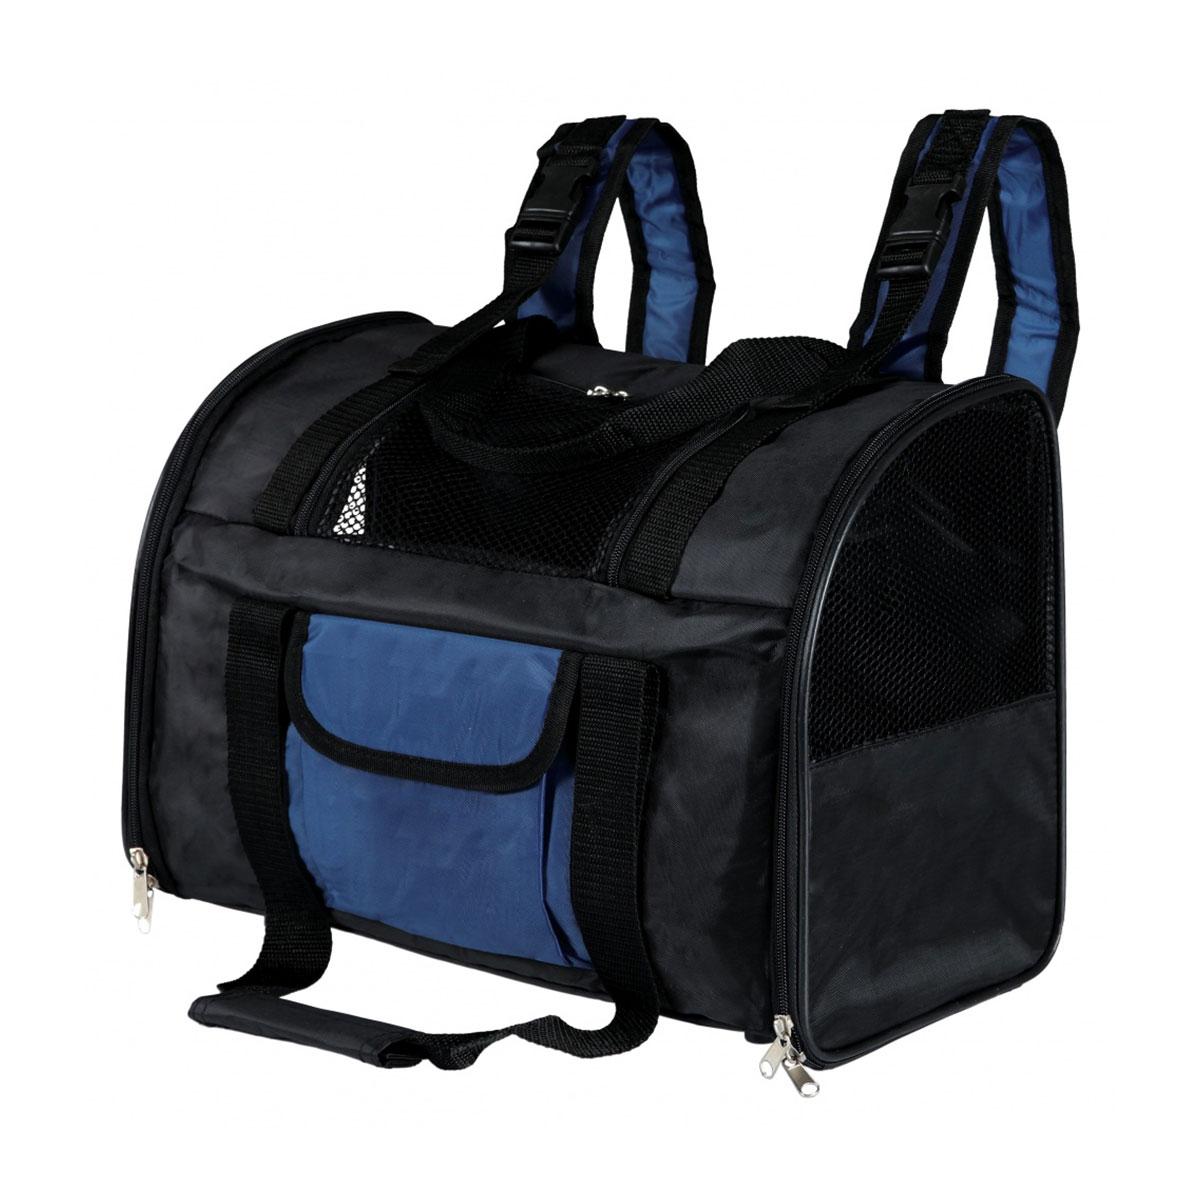 trixie transport rucksack f r hunde connor kaufen bei zooroyal. Black Bedroom Furniture Sets. Home Design Ideas